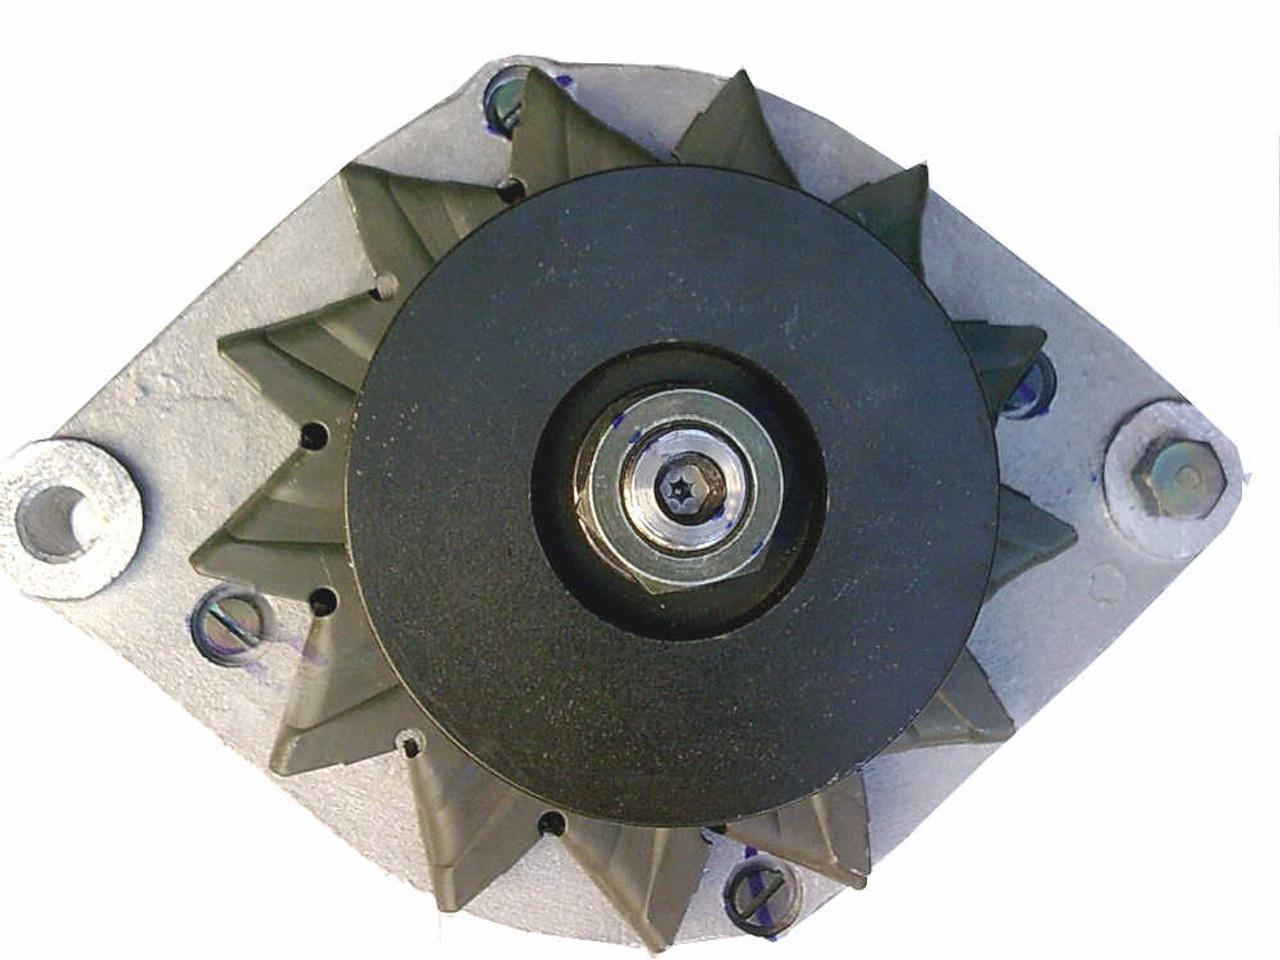 Perkins 4.236 'lowline' alternator (front view)